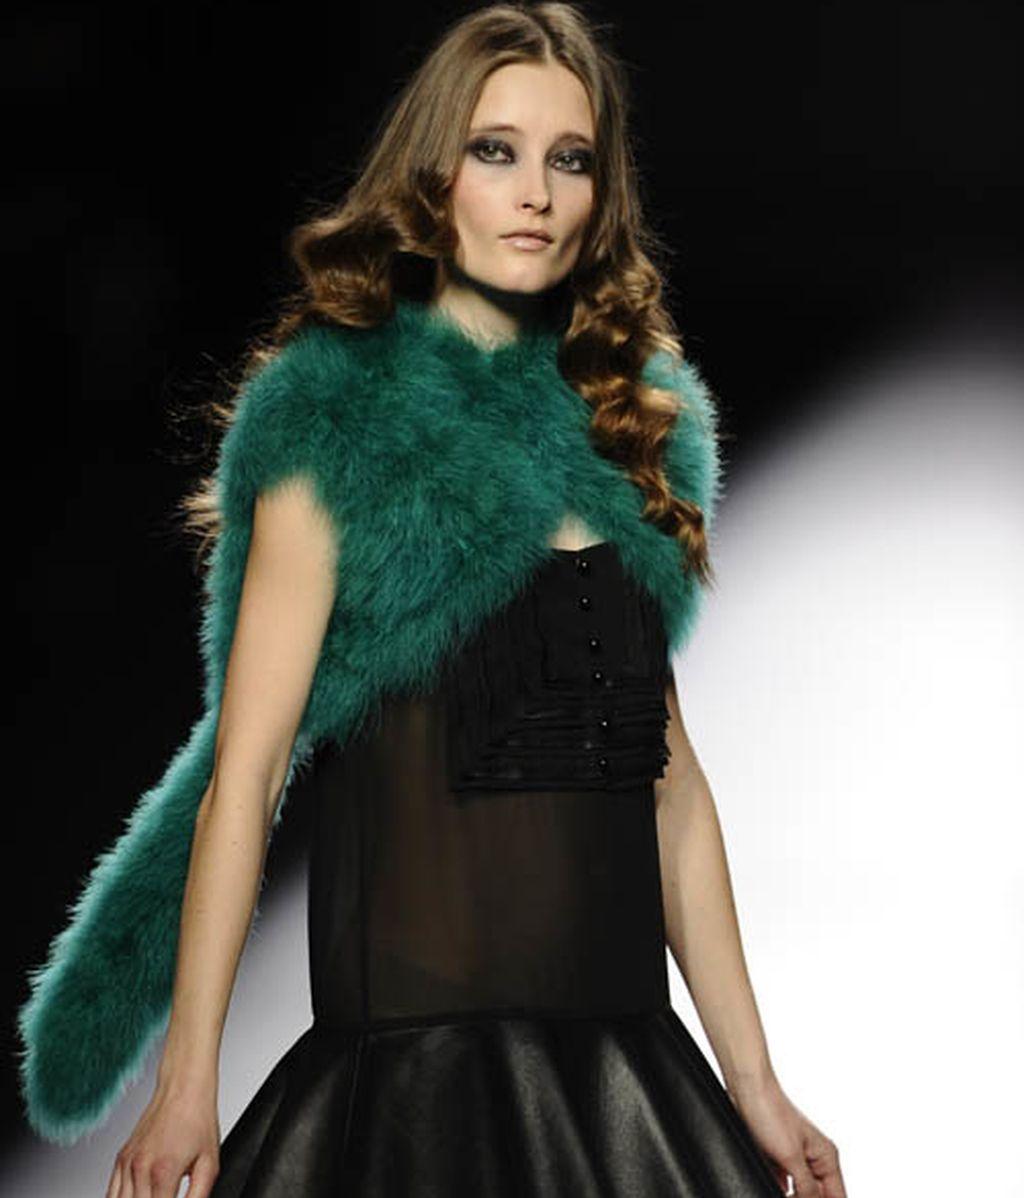 Teresa Helbig reivindica el 'espíritu artesano' de la moda